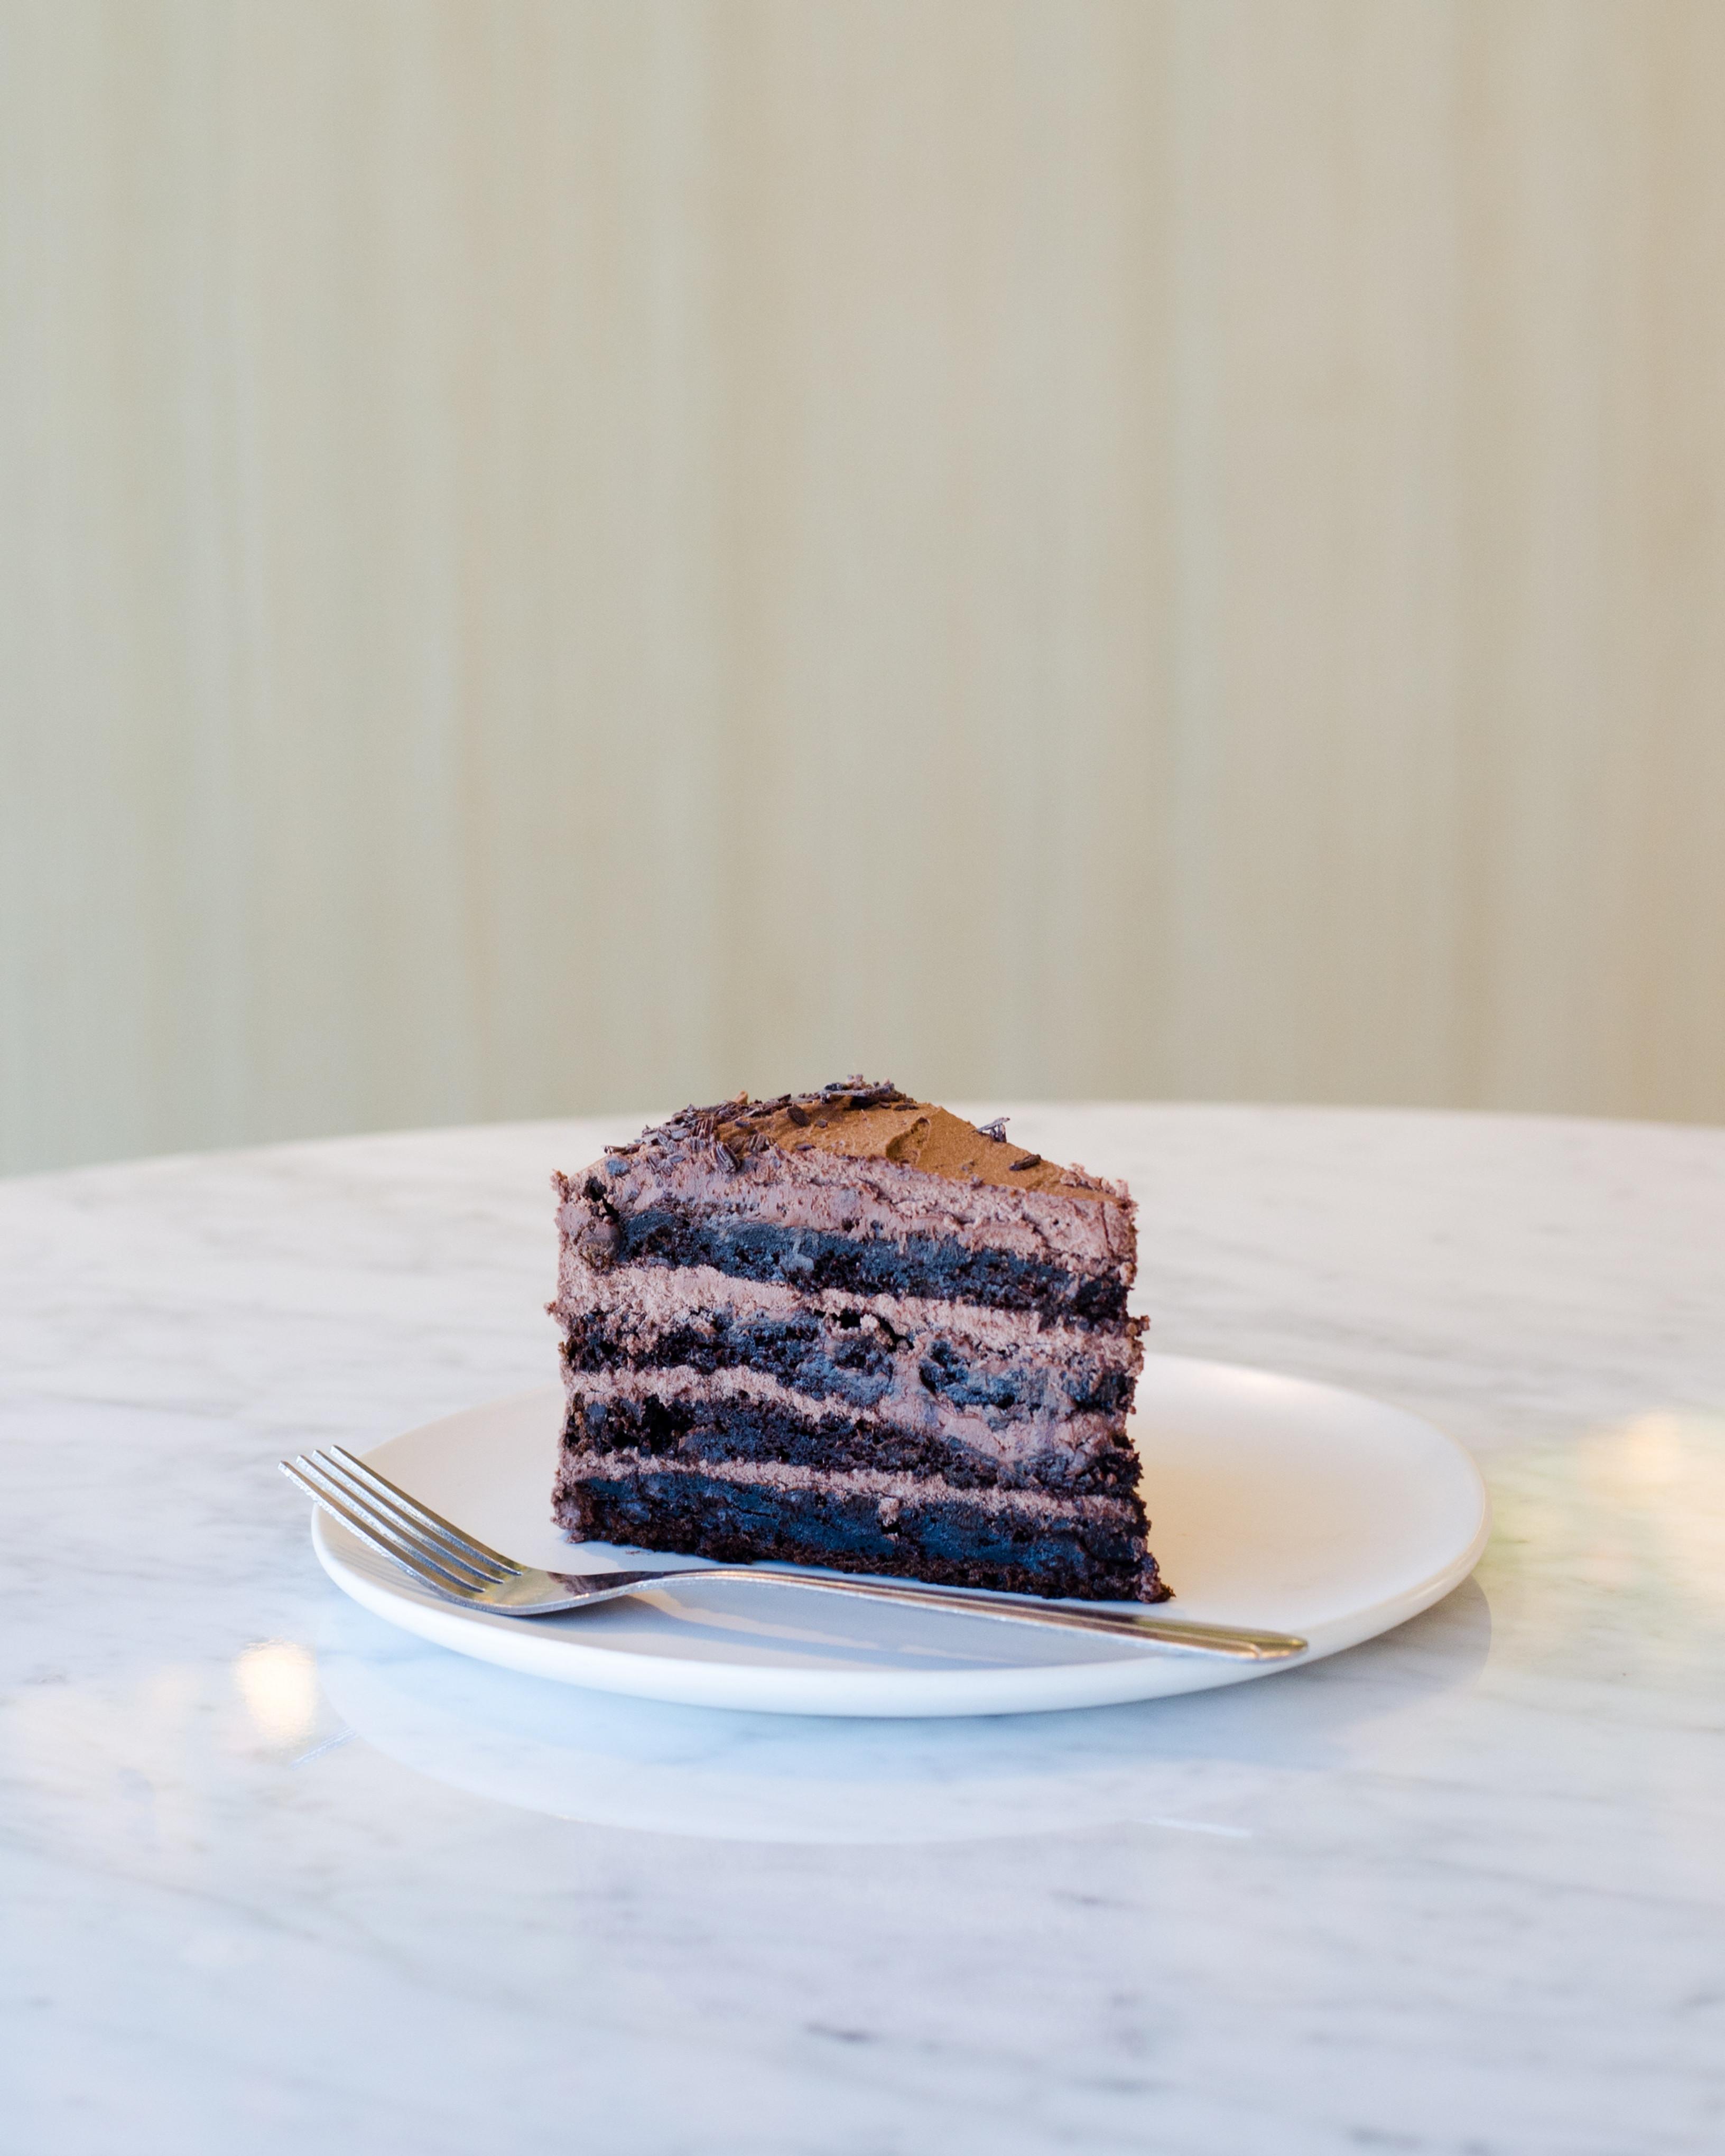 Cake Tasting & Consultation for Two